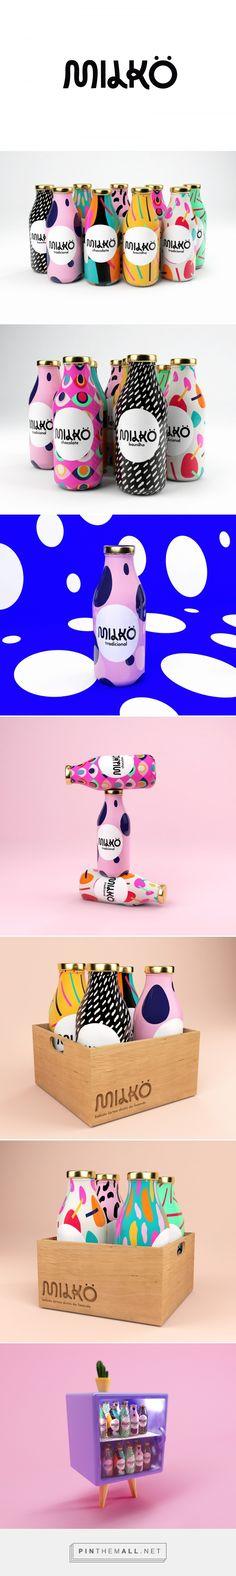 Milkö packaging design by Giovani Flores - http://www.packagingoftheworld.com/2017/01/milko.html